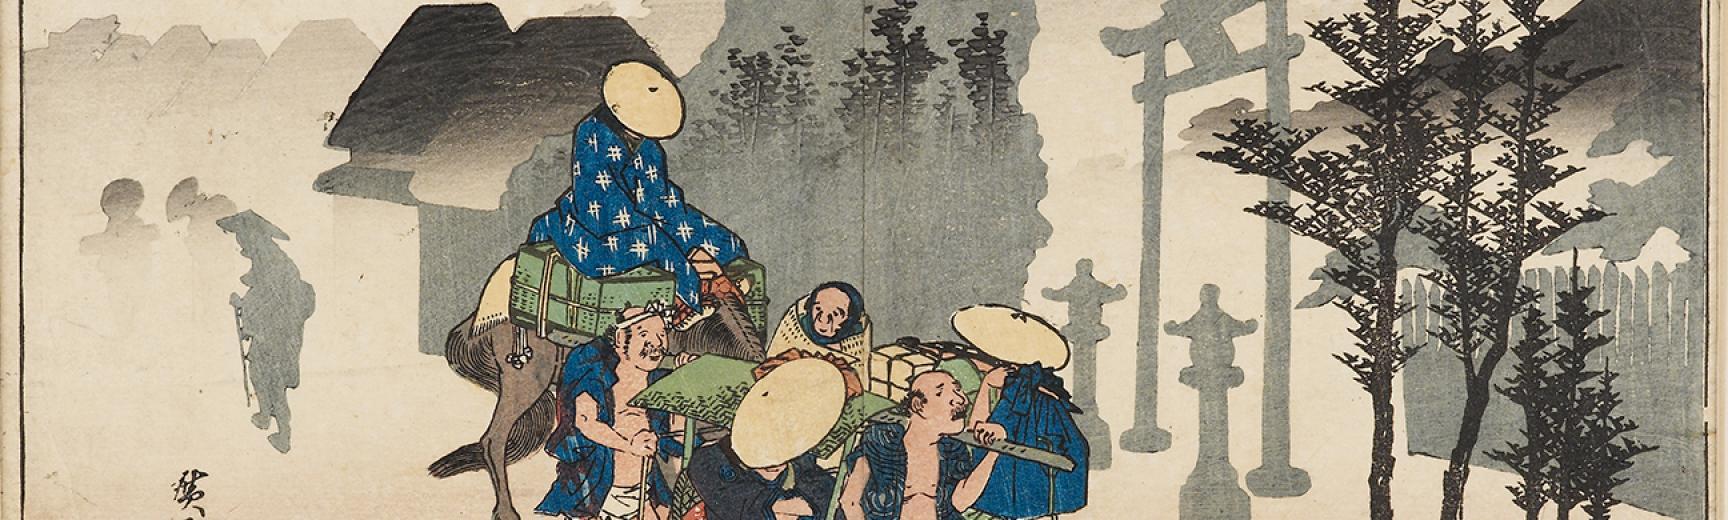 Morning Mist at Mishima, Hiroshige